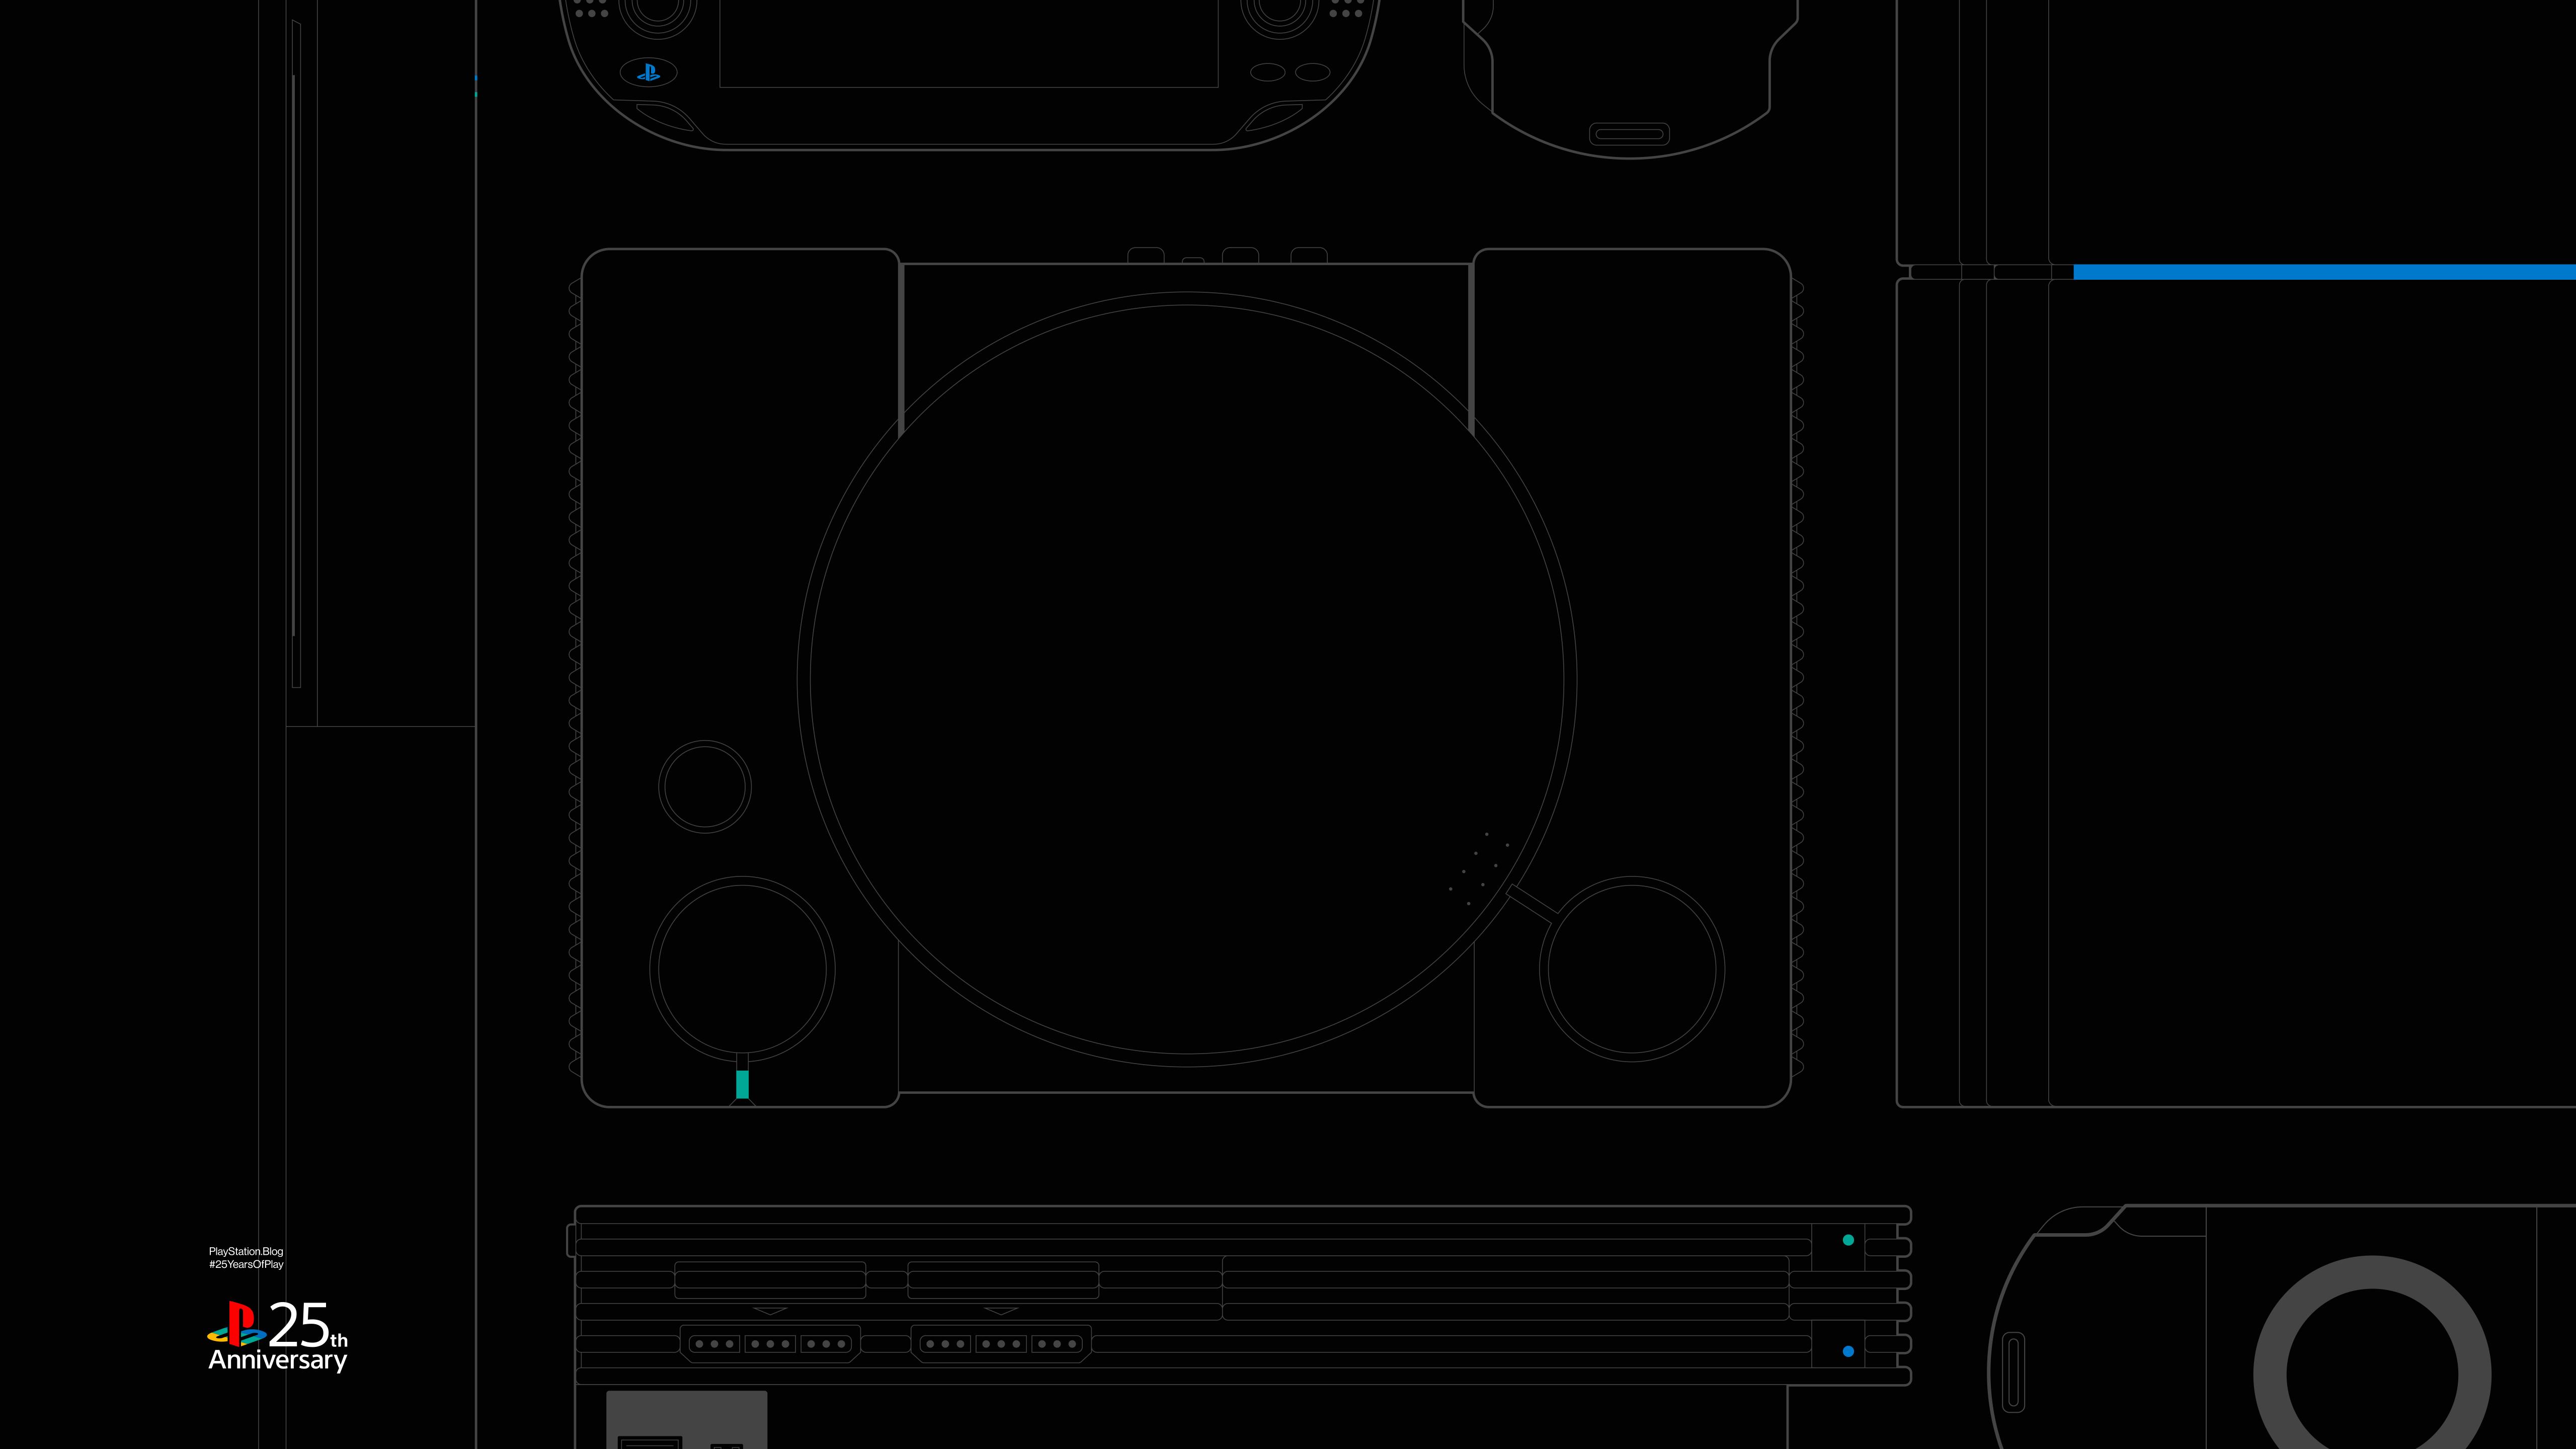 Wallpaper Playstation 2 Playstation 3 Playstation 4 5120x2880 Midoki 1723813 Hd Wallpapers Wallhere